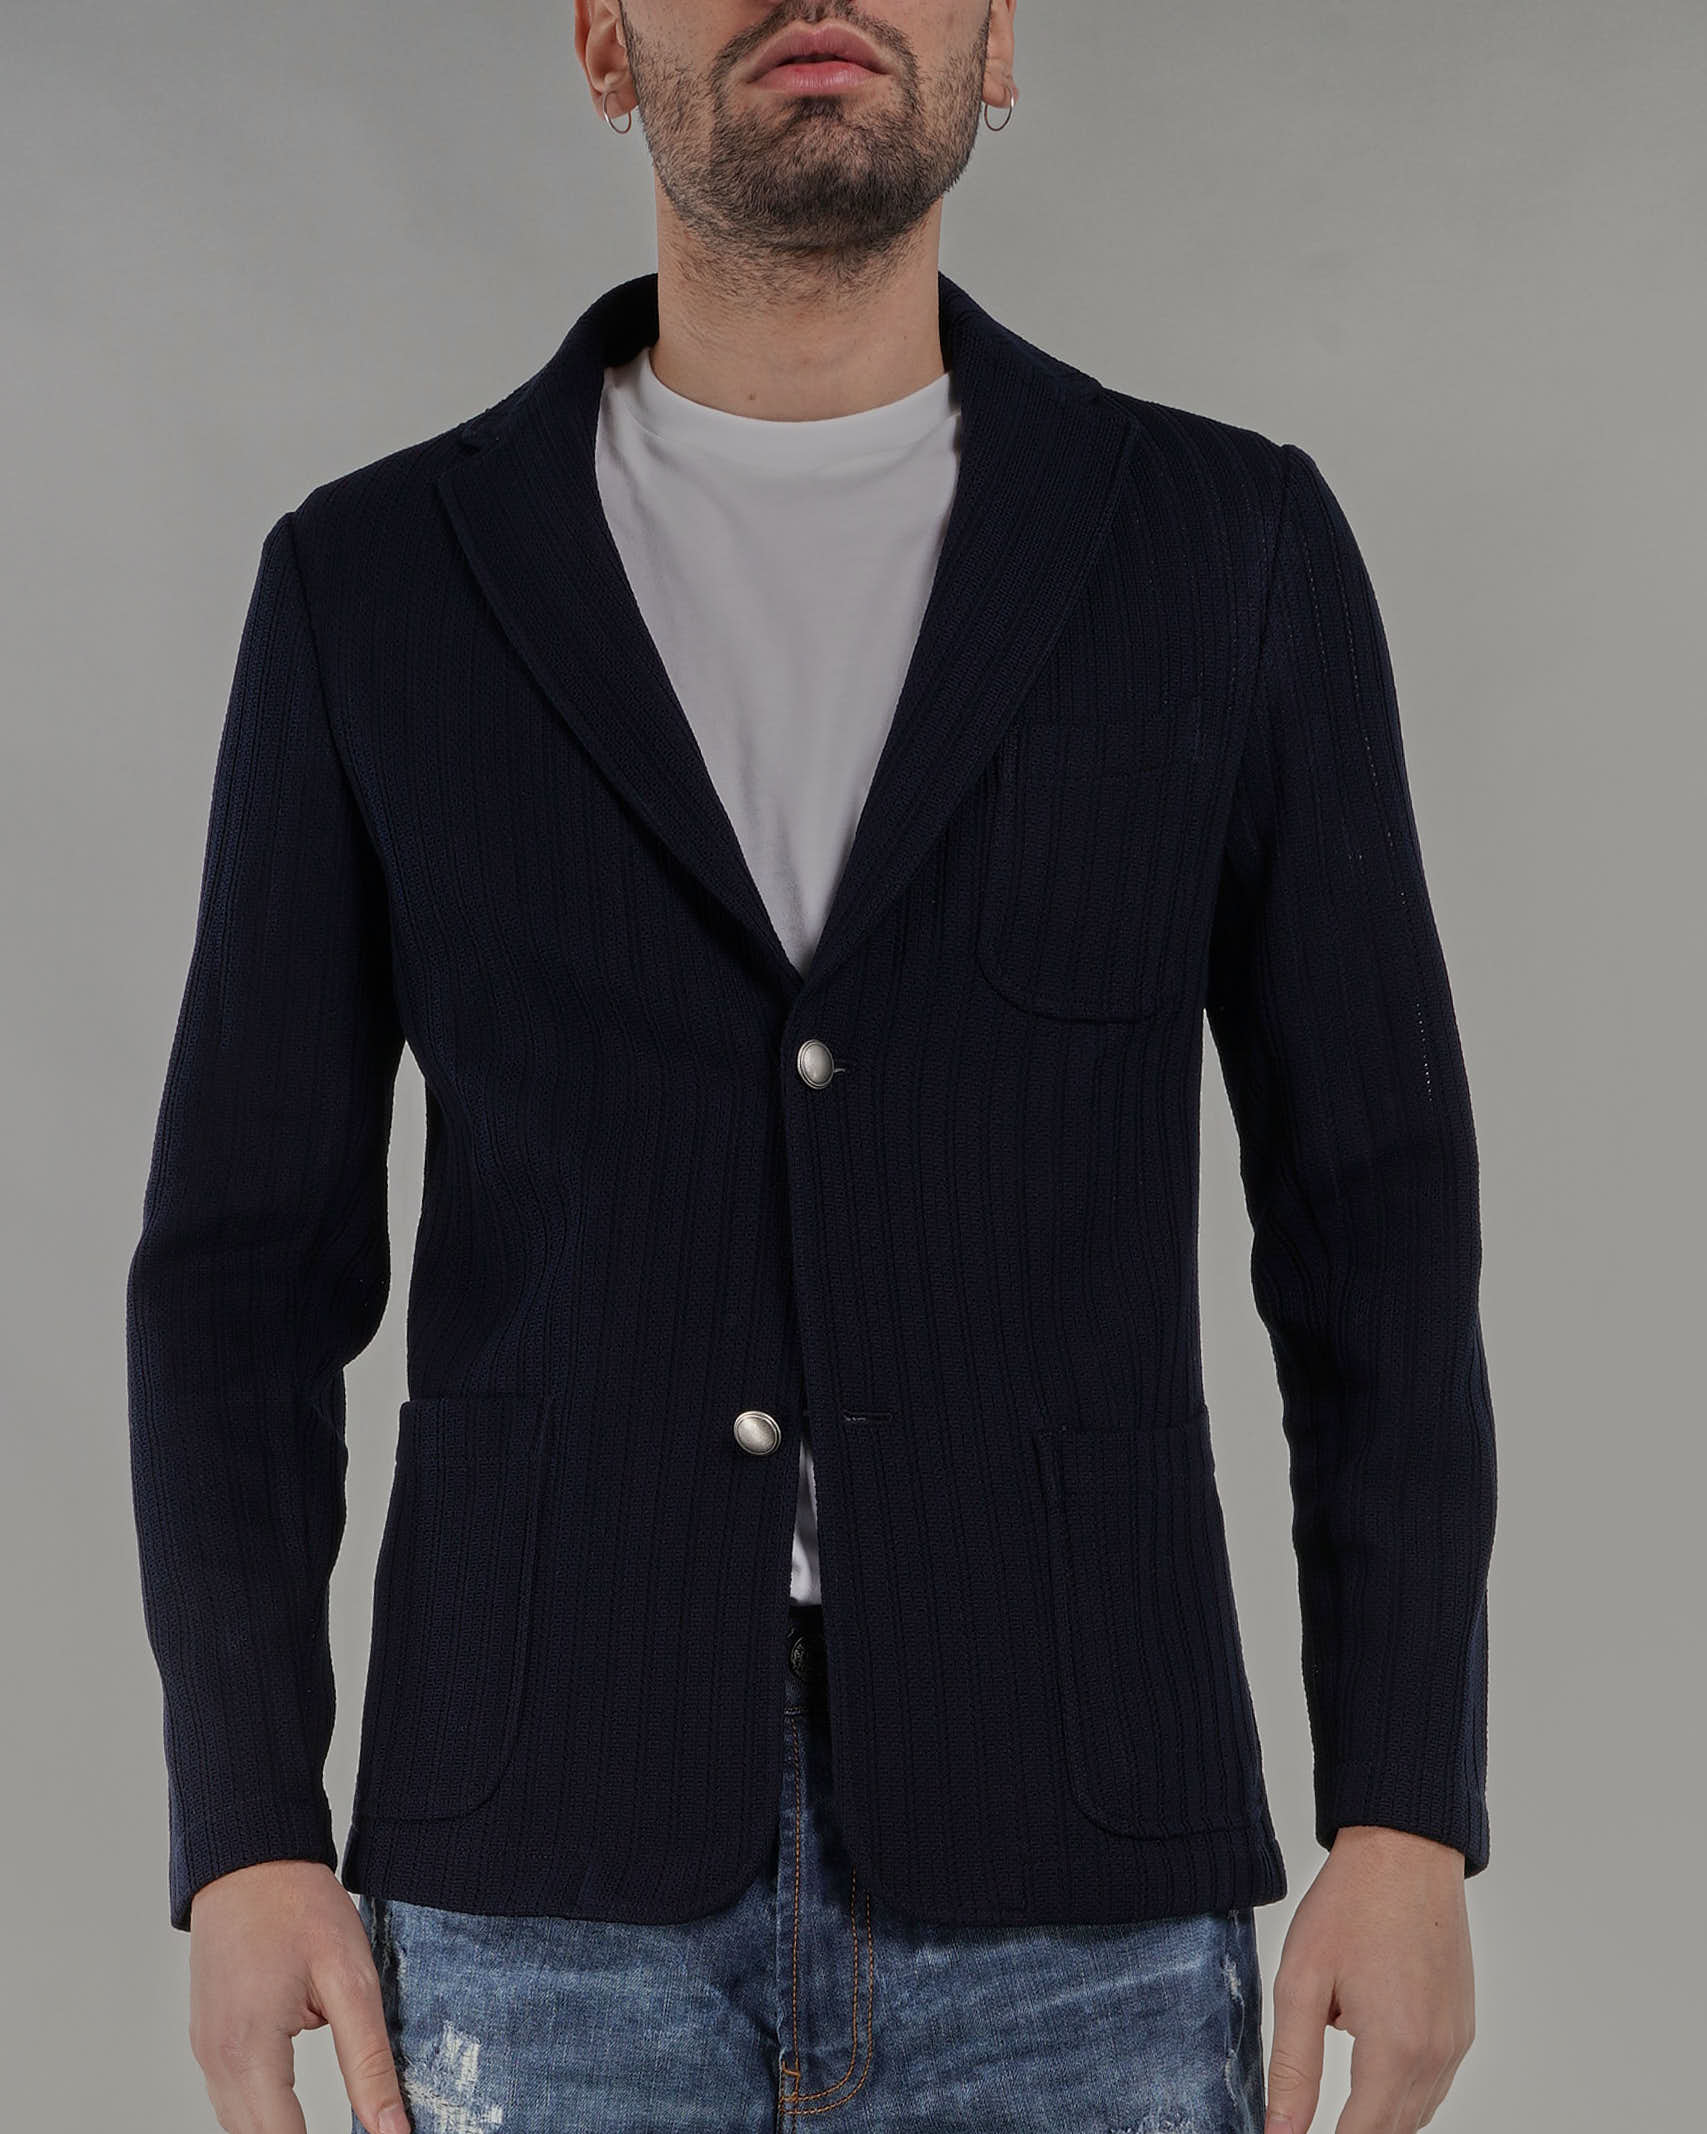 Giacca in maglia microforata Jeordie's JEORDIE'S | Giacca | 77130400